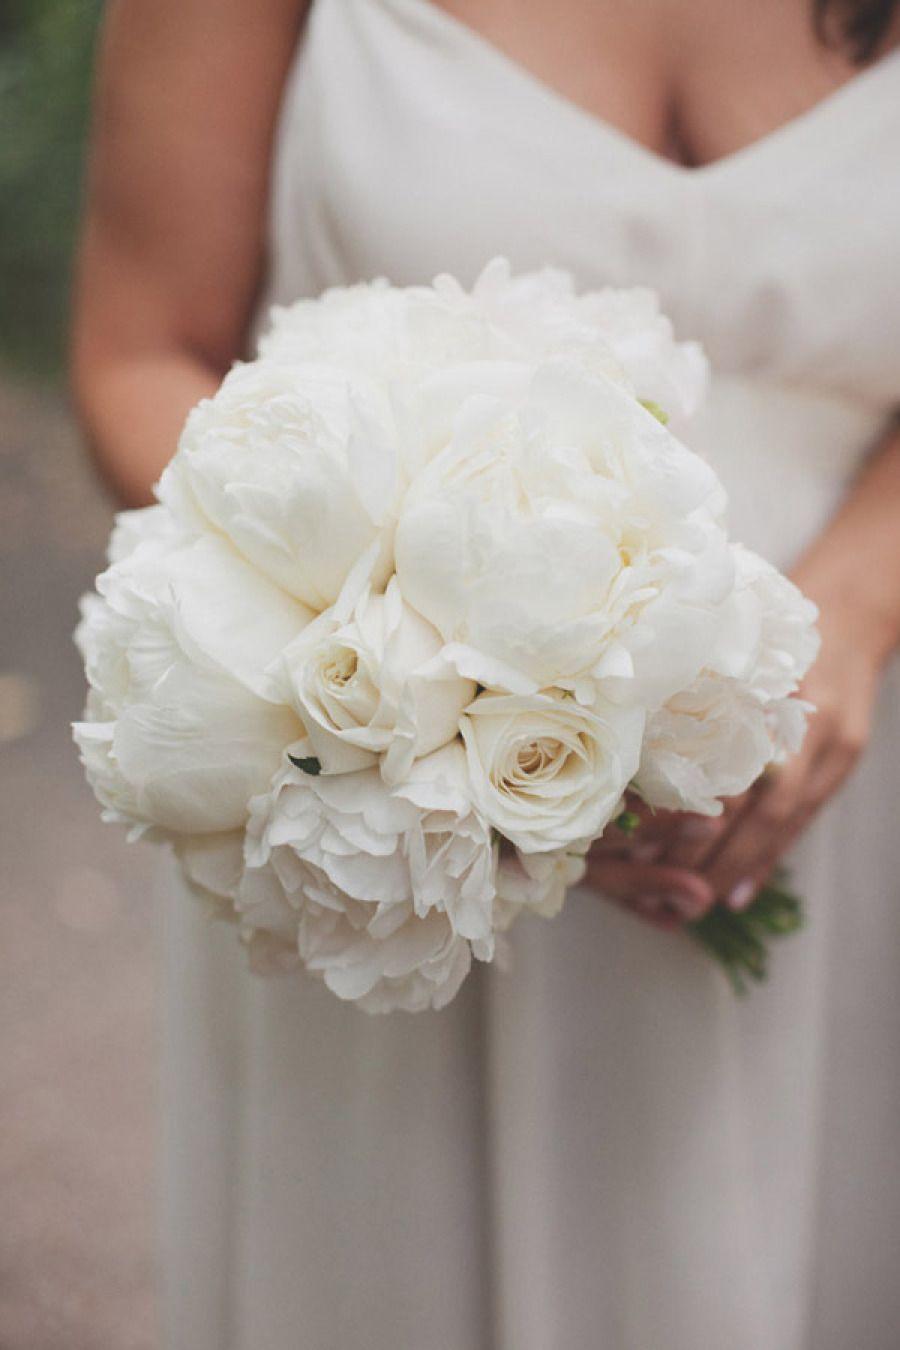 Floral Design: Cartier for Flowers - cartierforflowers.co.nz/ Photography: Kate MacPherson Photographer - katemacpherson.com/ Wedding Coordination